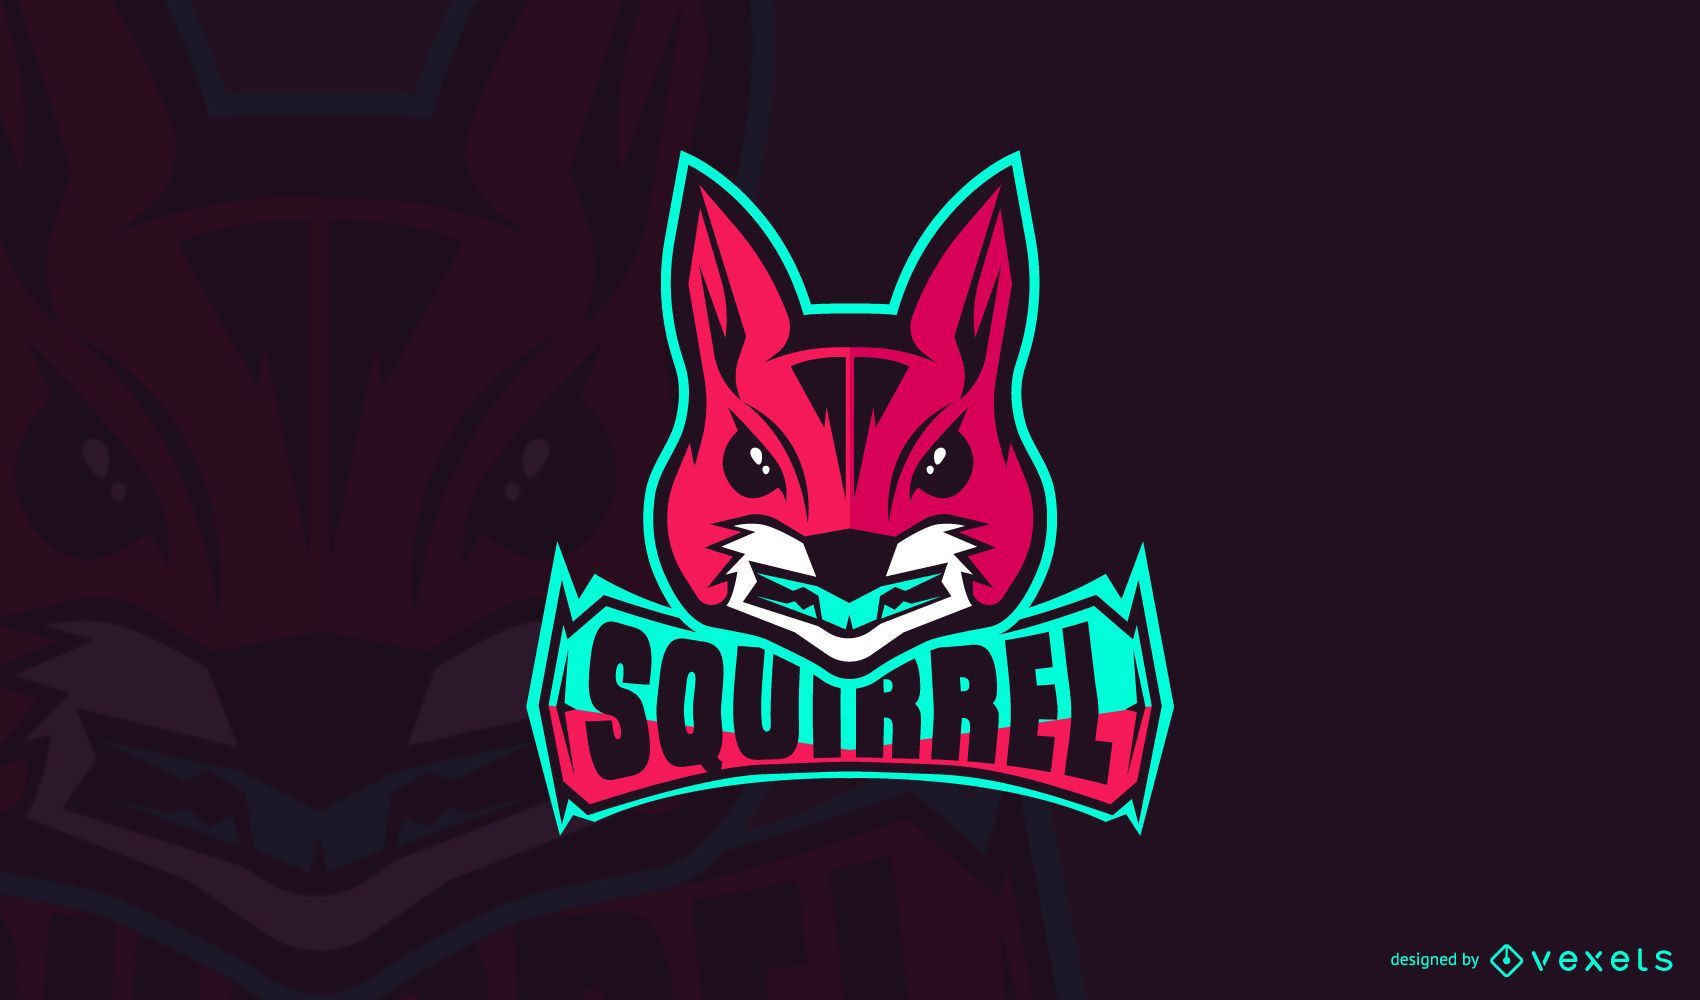 Squirrel gaming logo template